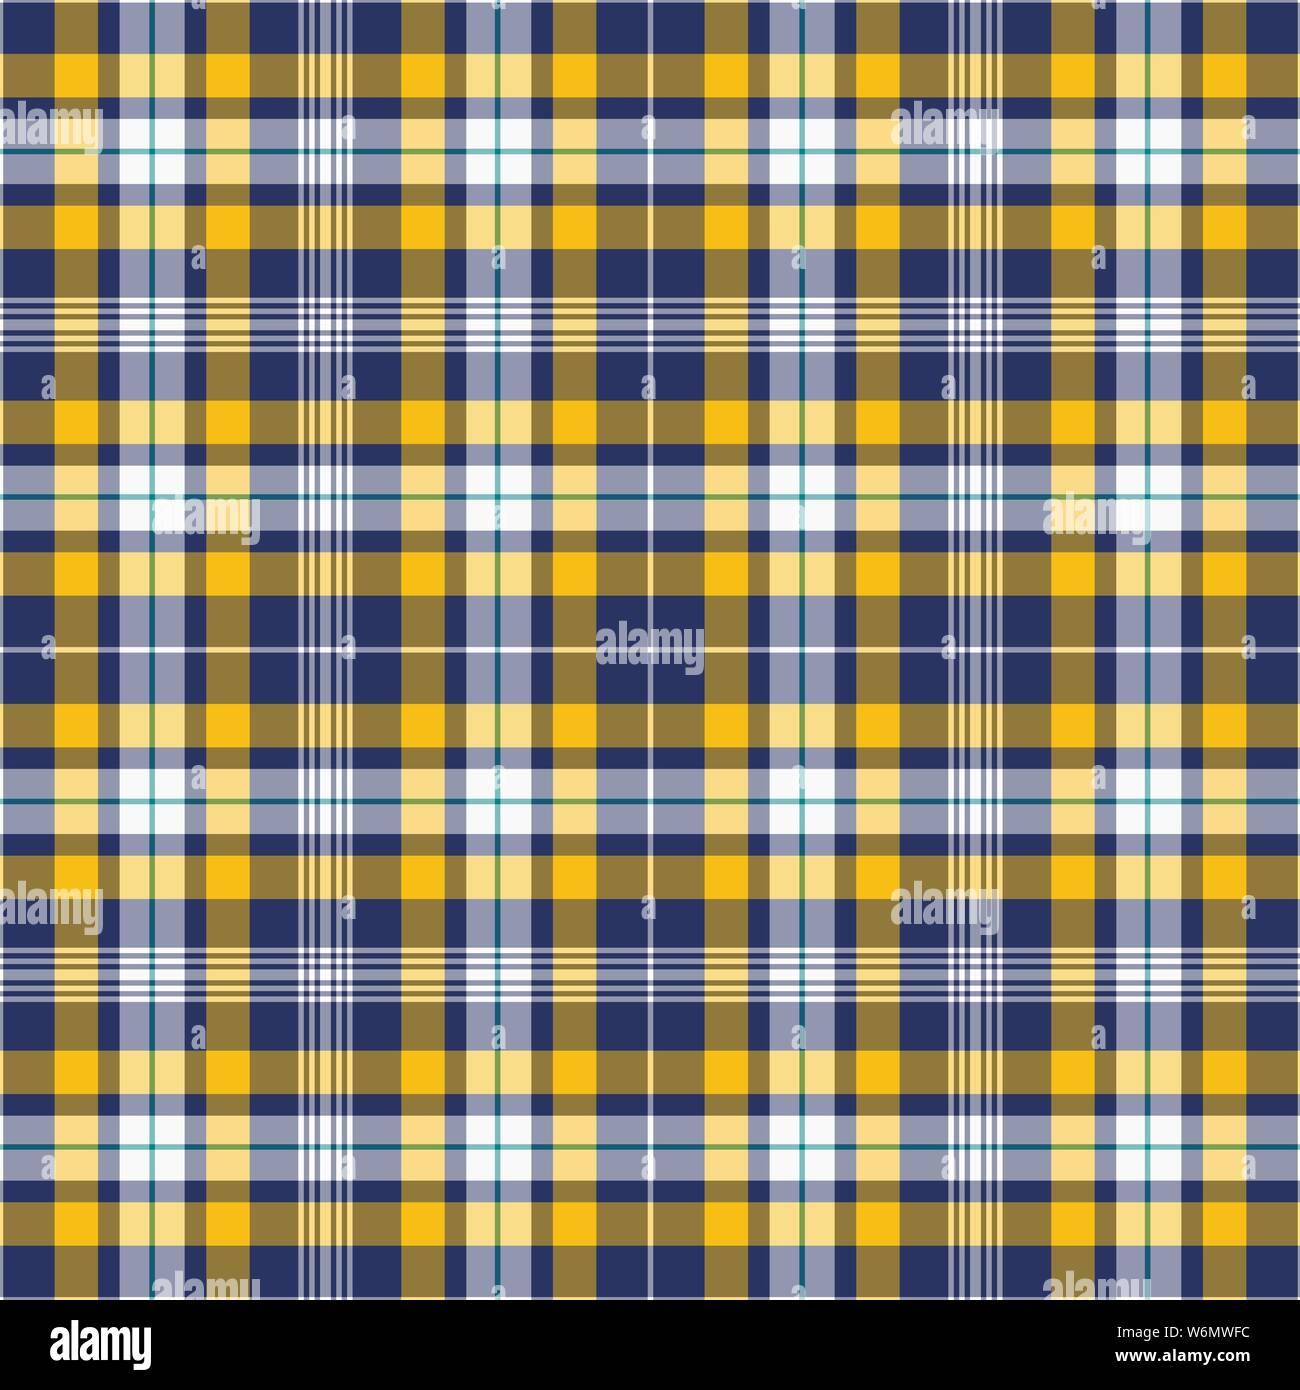 Material de la Tela Escocesa Cuadros Tartán-Azul Marino Amarillo Rojo